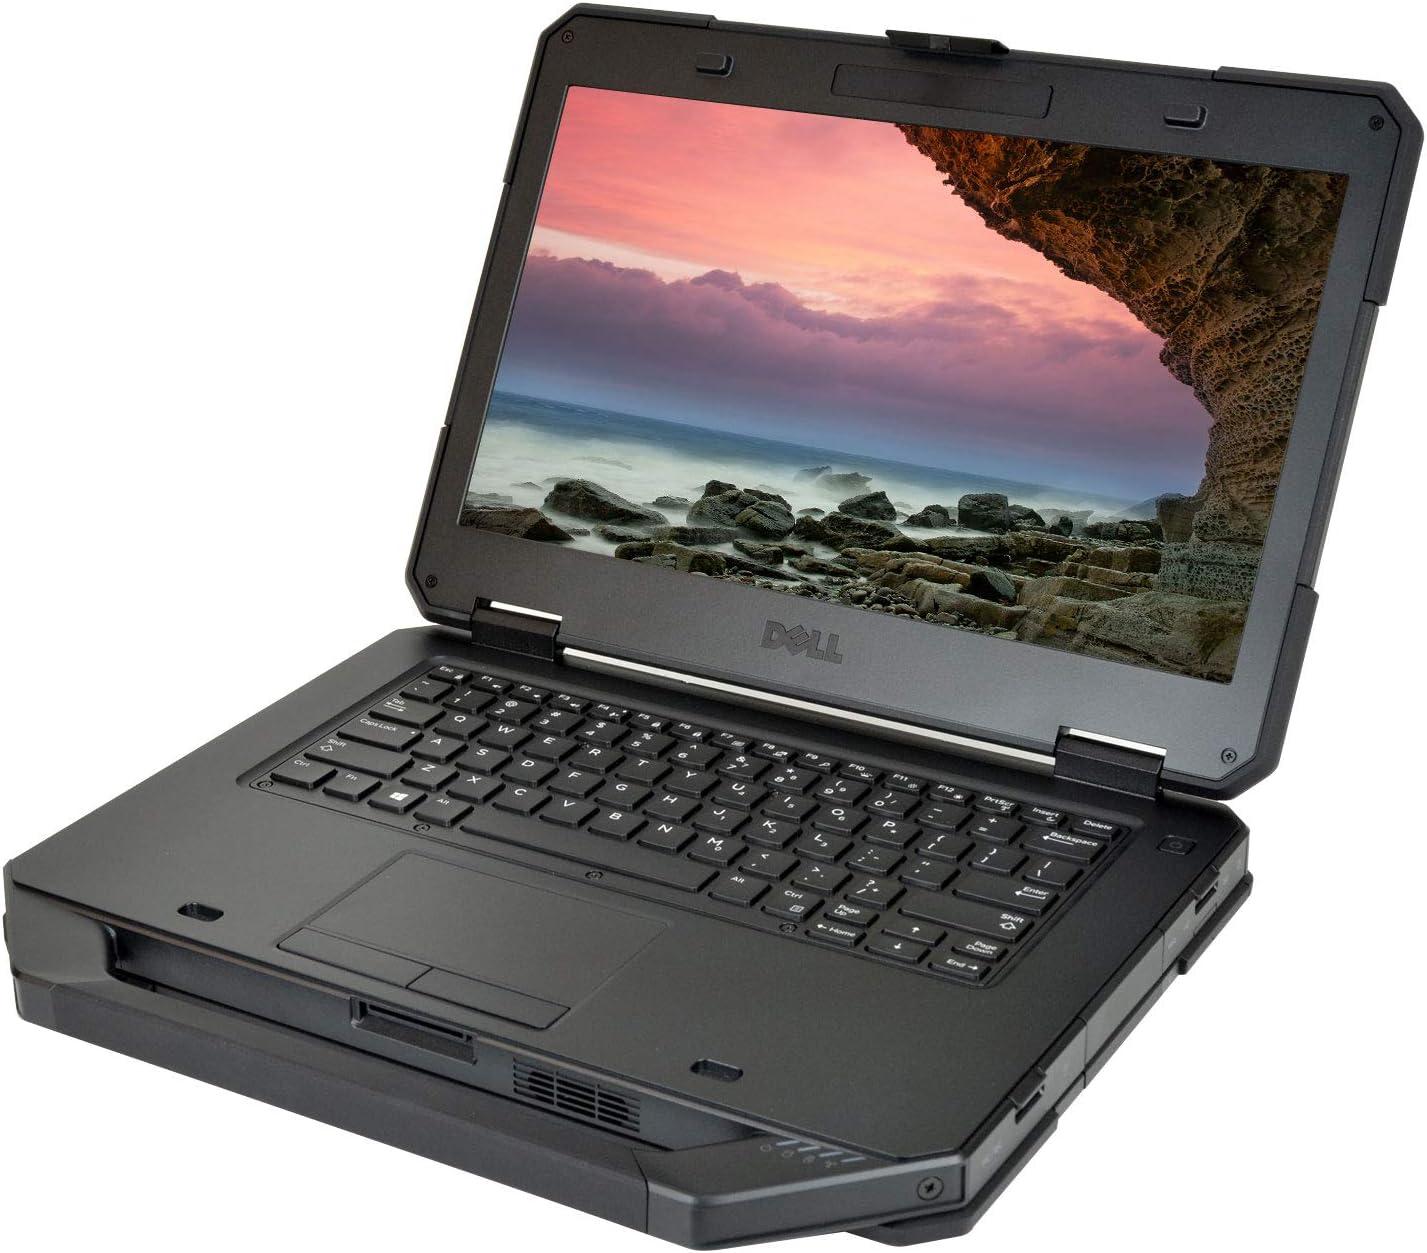 Dell Latitude 5404 Rugged 14 inches Laptop, Core i5-4310U 2.0GHz, 8GB Ram, 512GB SSD, DVDRW, Windows 10 Pro 64bit (Renewed)